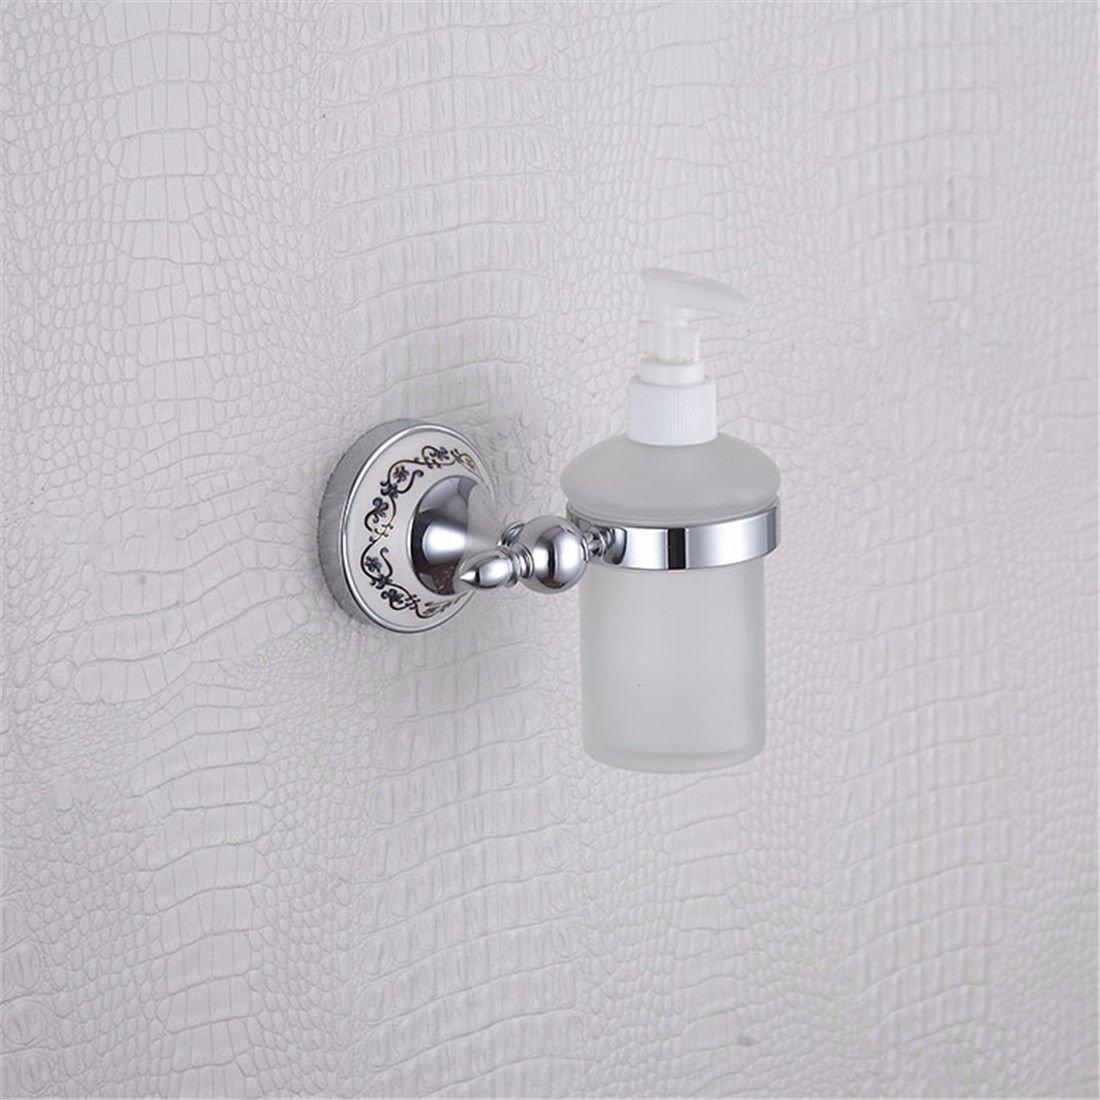 AiRobin-Contemporary Brass Chrome Plated Blue and White Porcelain Lotion Dispenser Bathroom Accessory